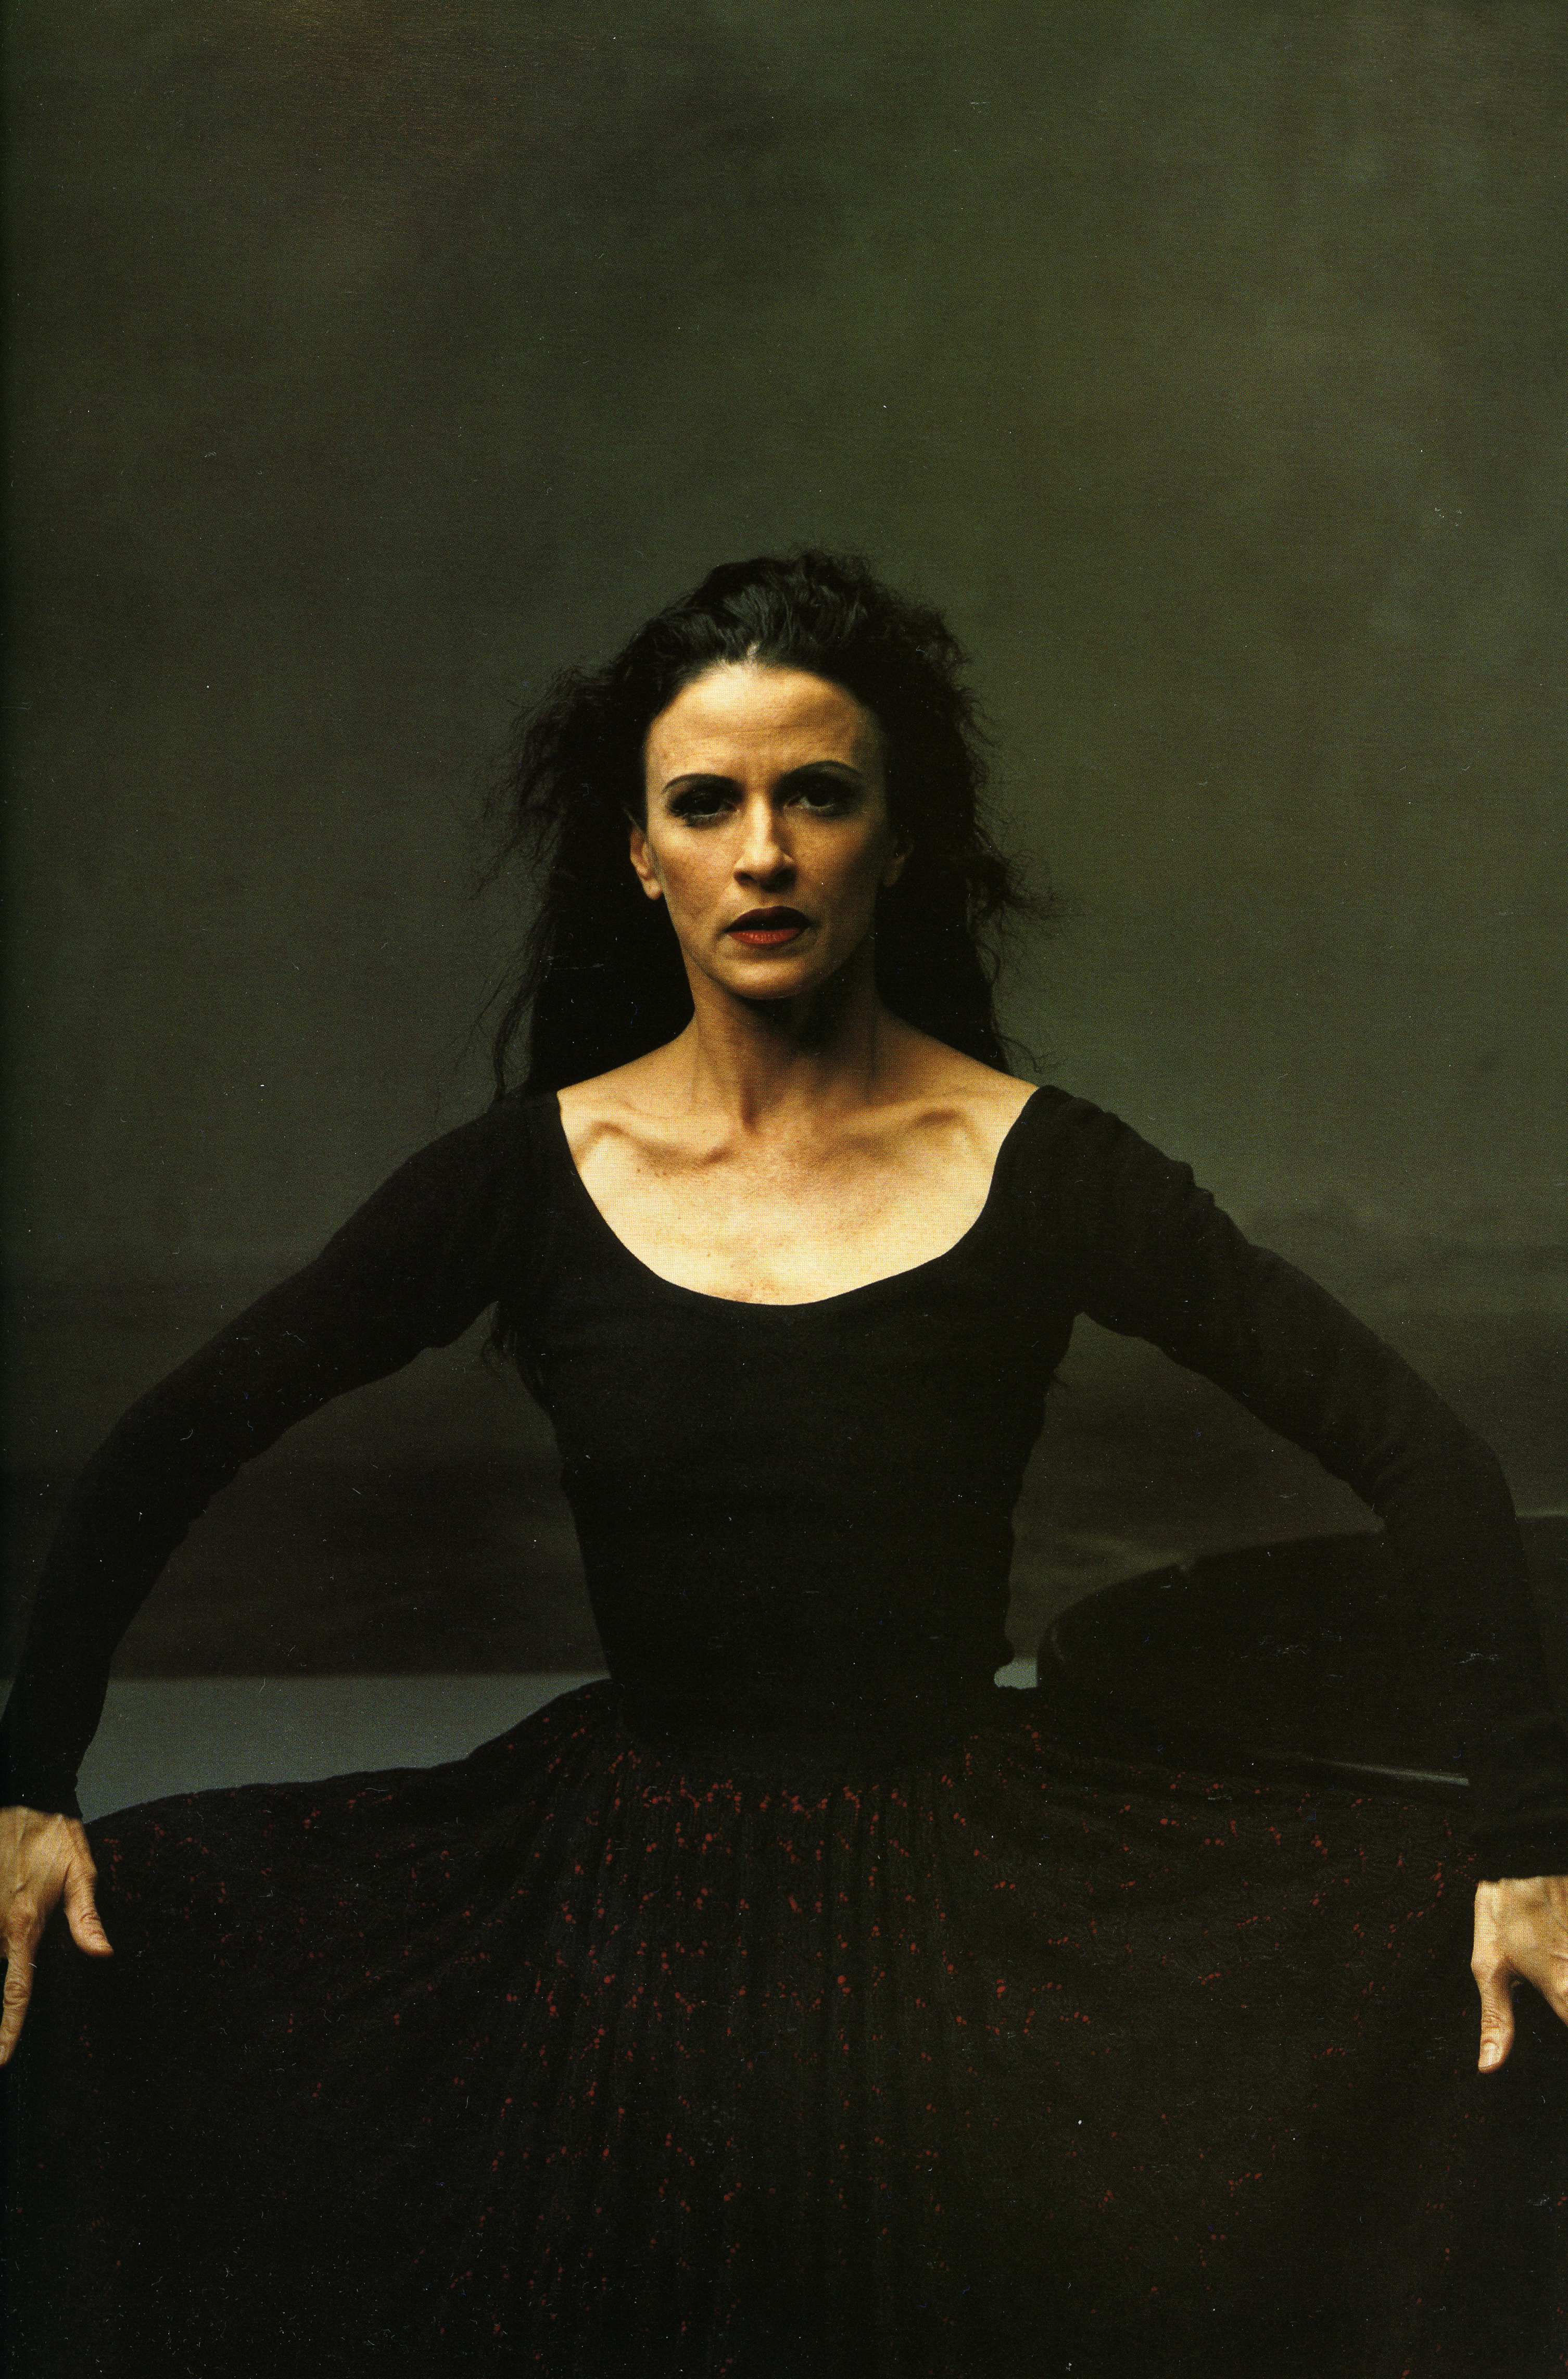 leibovitz_teresa-capucilli-martha-graham-dance-company-nyc